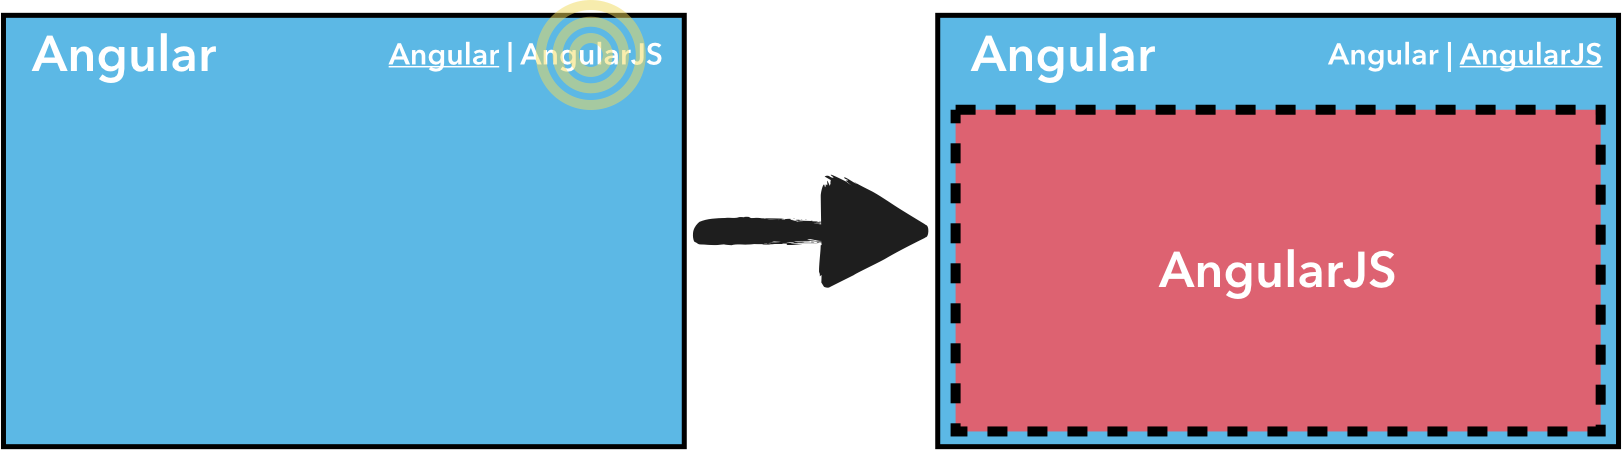 Bullet proof AngularJS migration using iframes